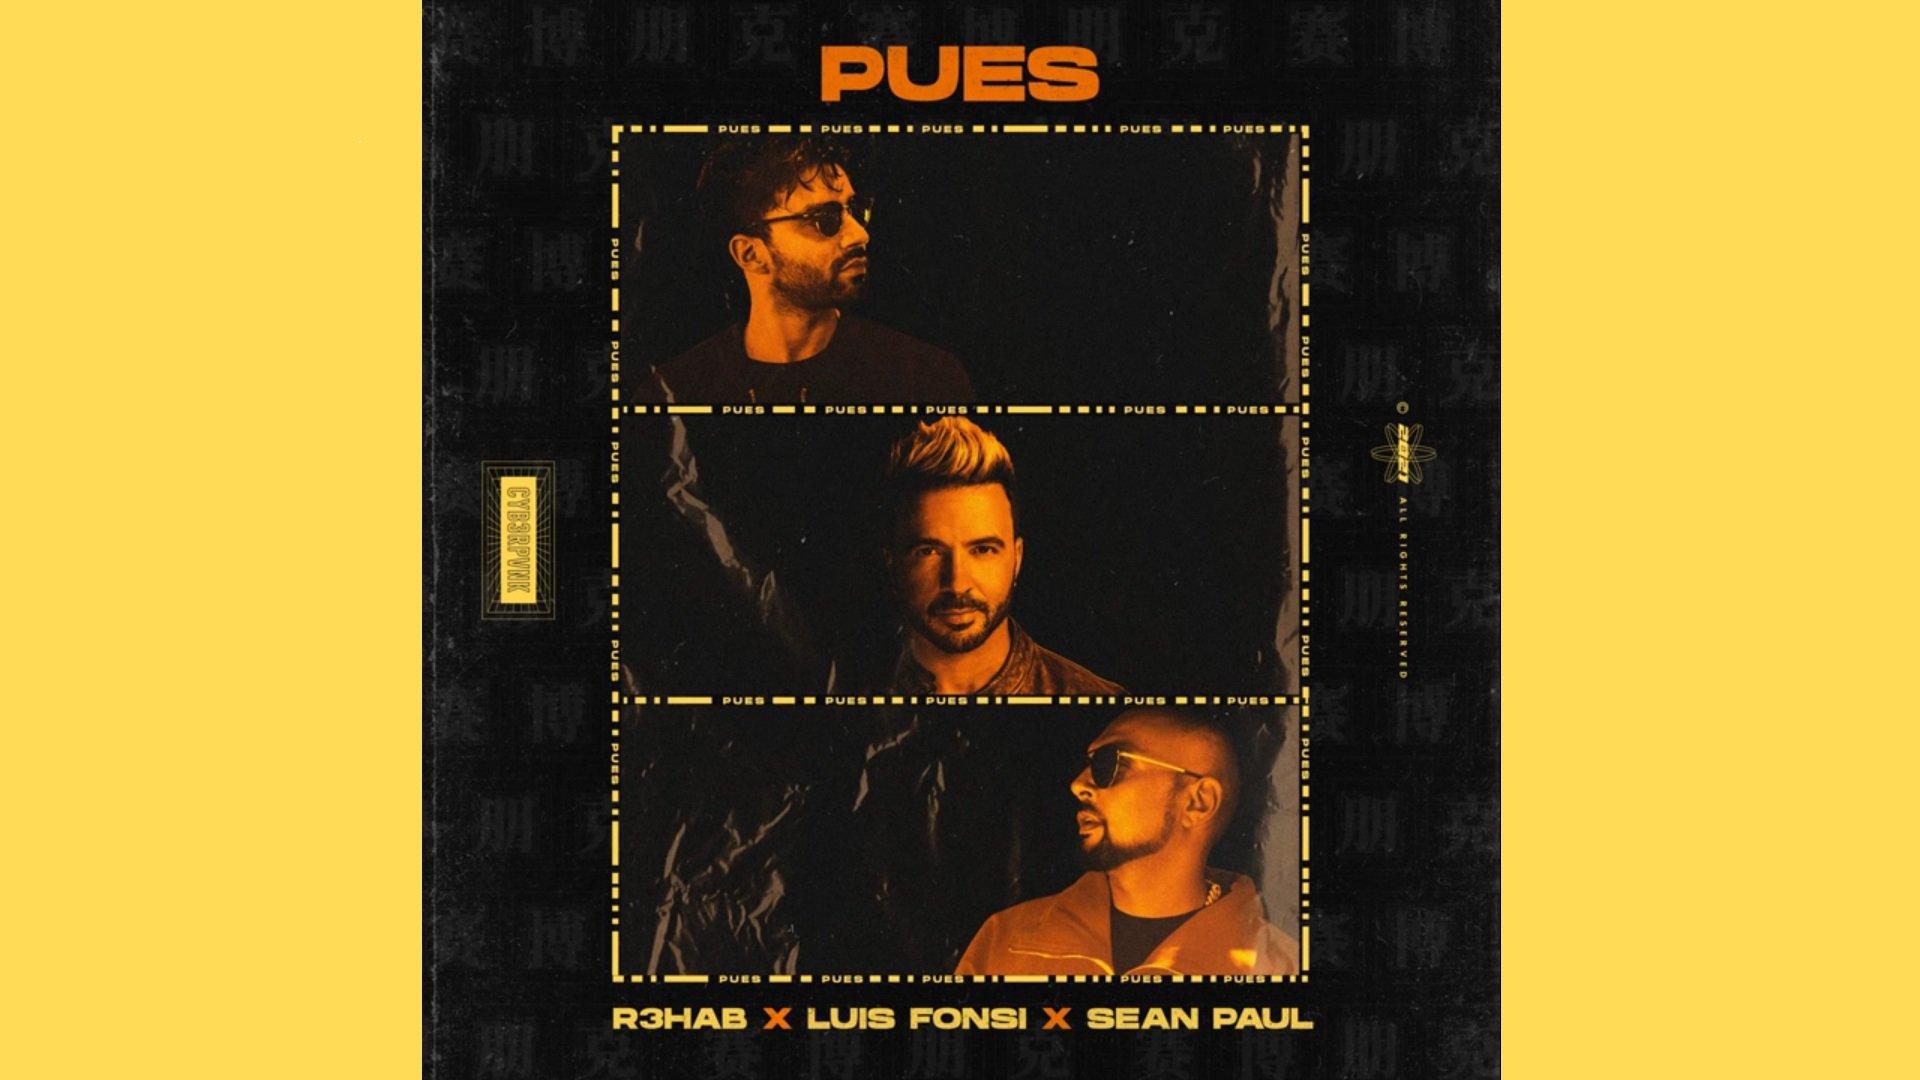 R3HAB x Luis Fonsi x Sean Paul PUES